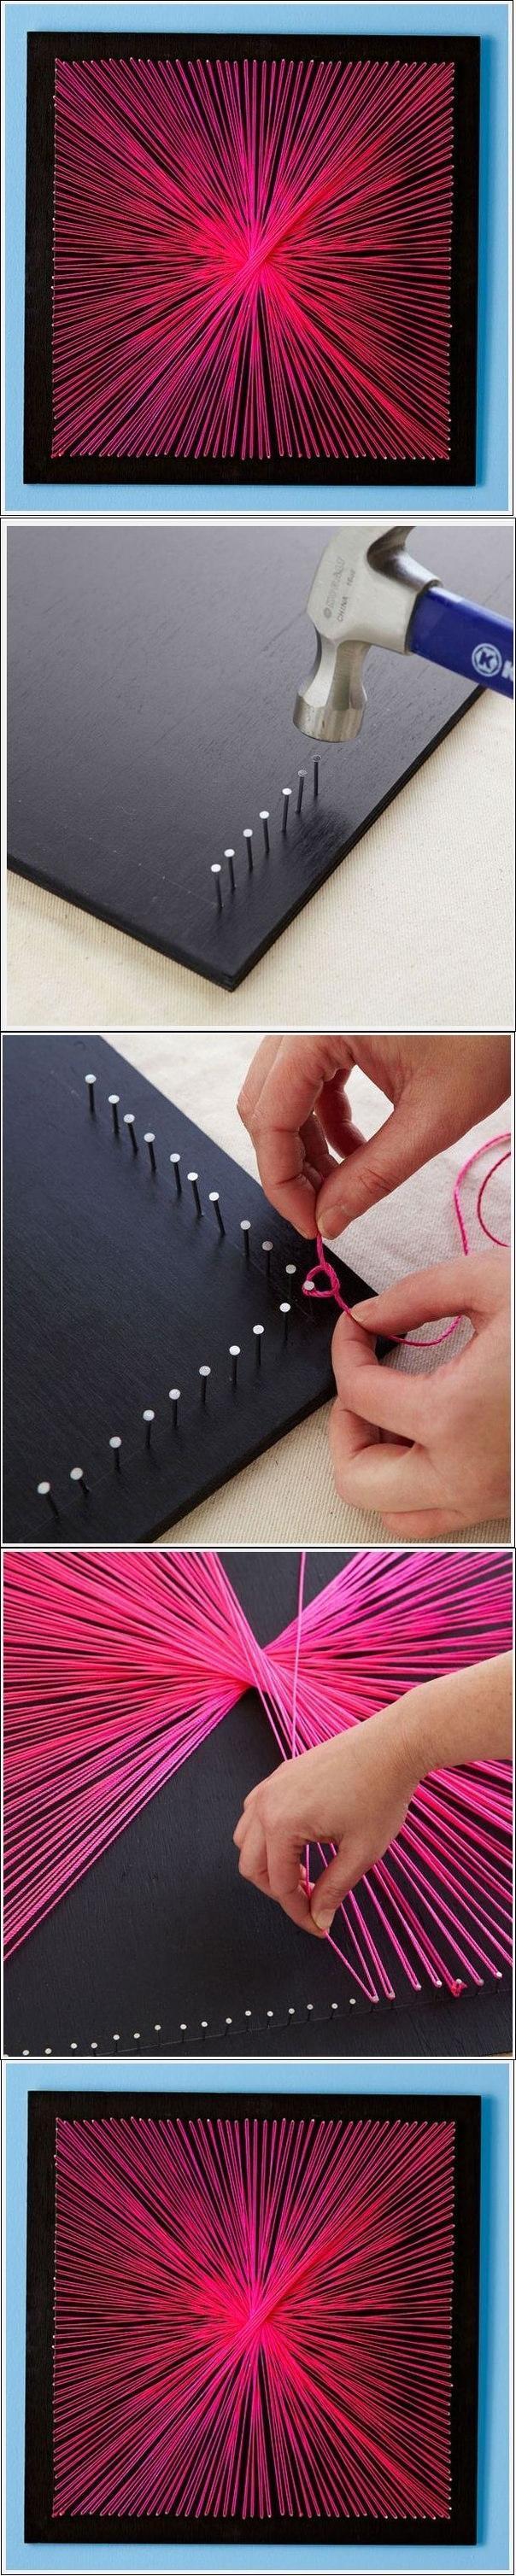 DIY String Art DIY Projects | UsefulDIY.com